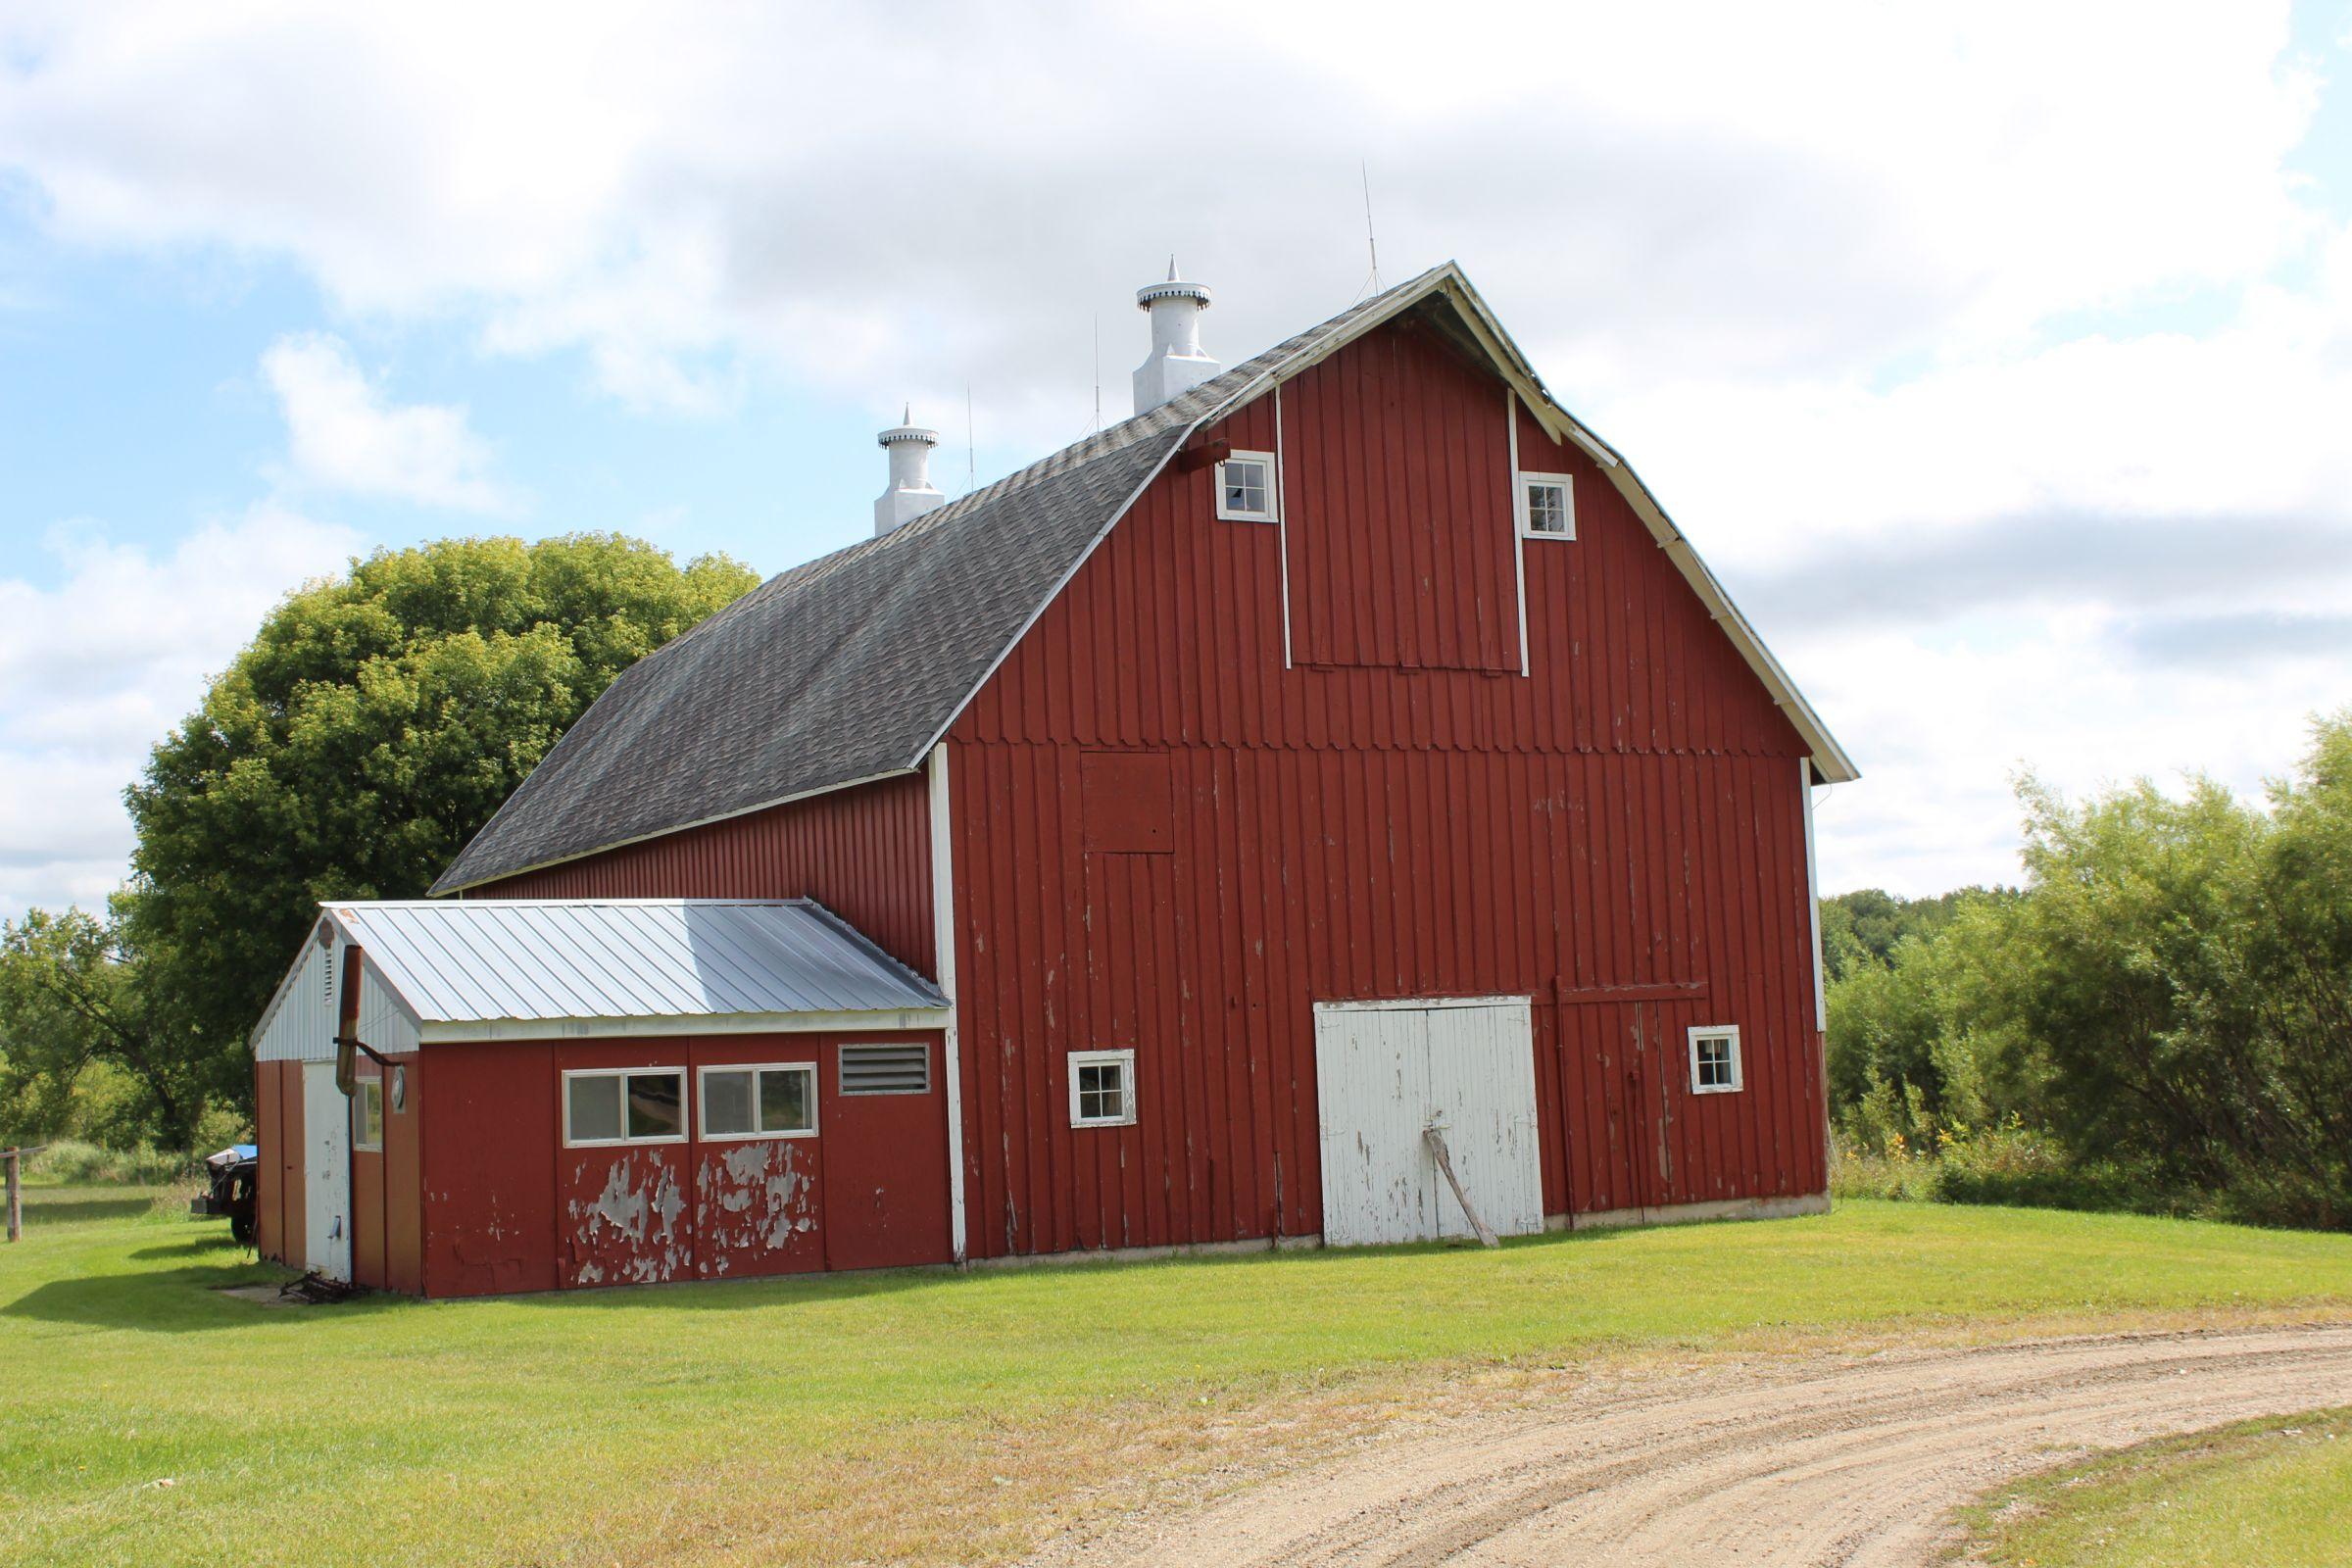 residential-land-mcleod-county-minnesota-80-acres-listing-number-15182-1-2020-09-23-163821.JPG